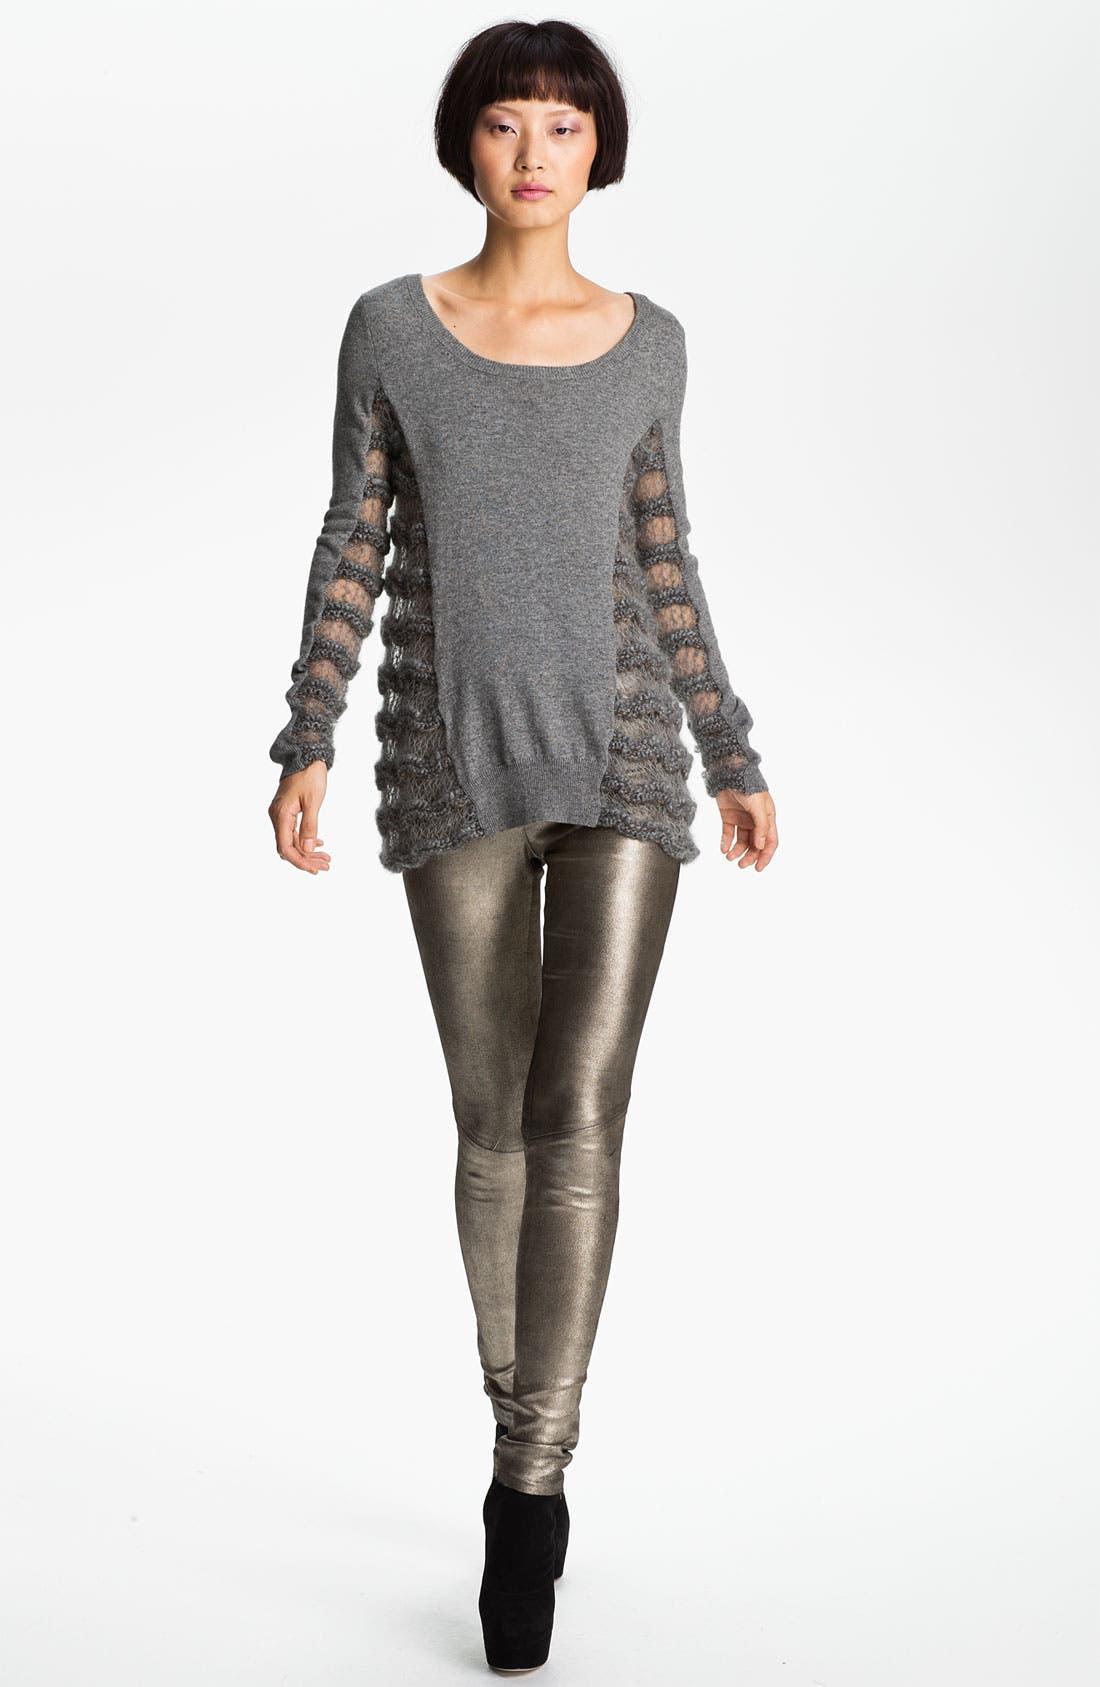 Main Image - Skaist-Taylor Drop Stitch Sweater